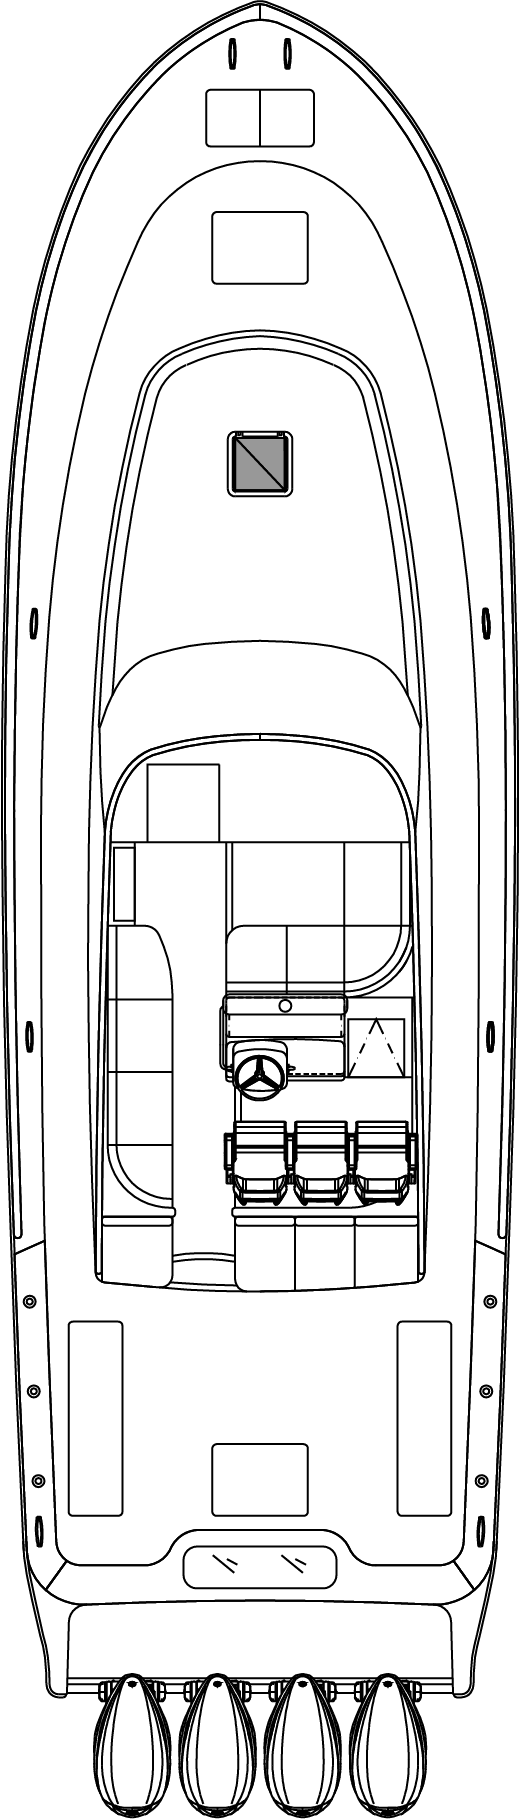 47fr vertical